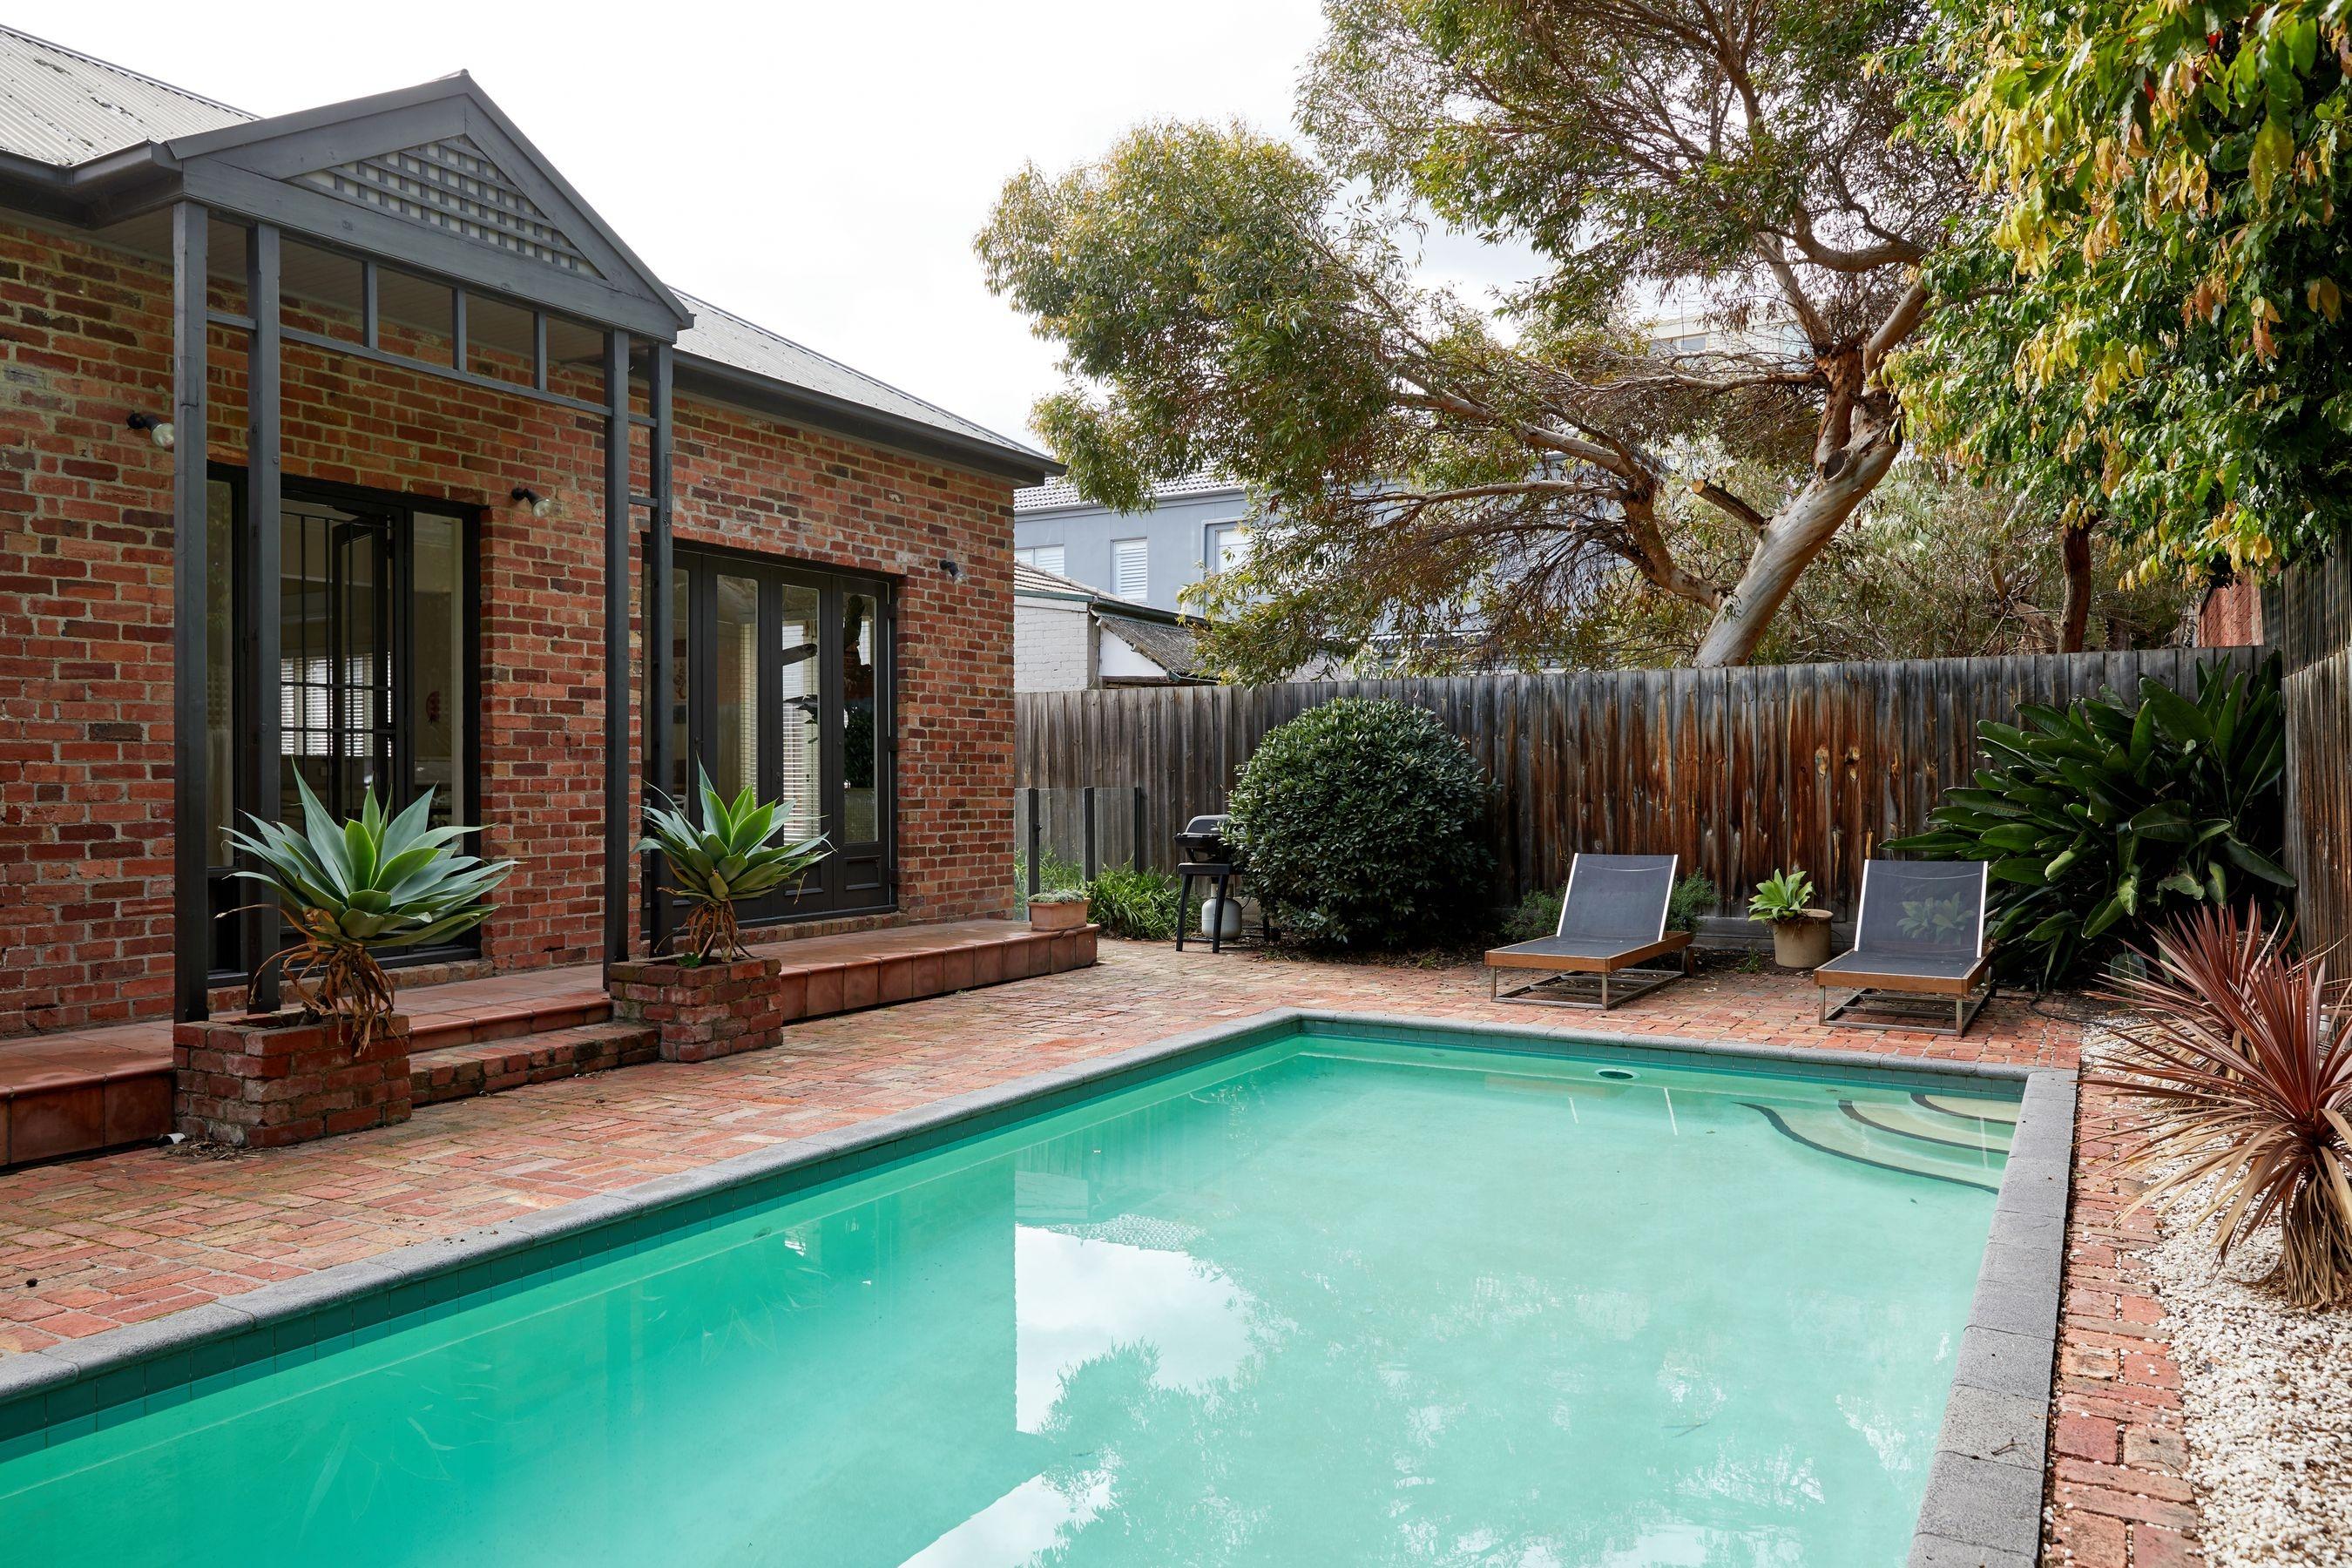 Oceania - Australia - Victoria area - Melbourne area - Pasley St - Image 1/27